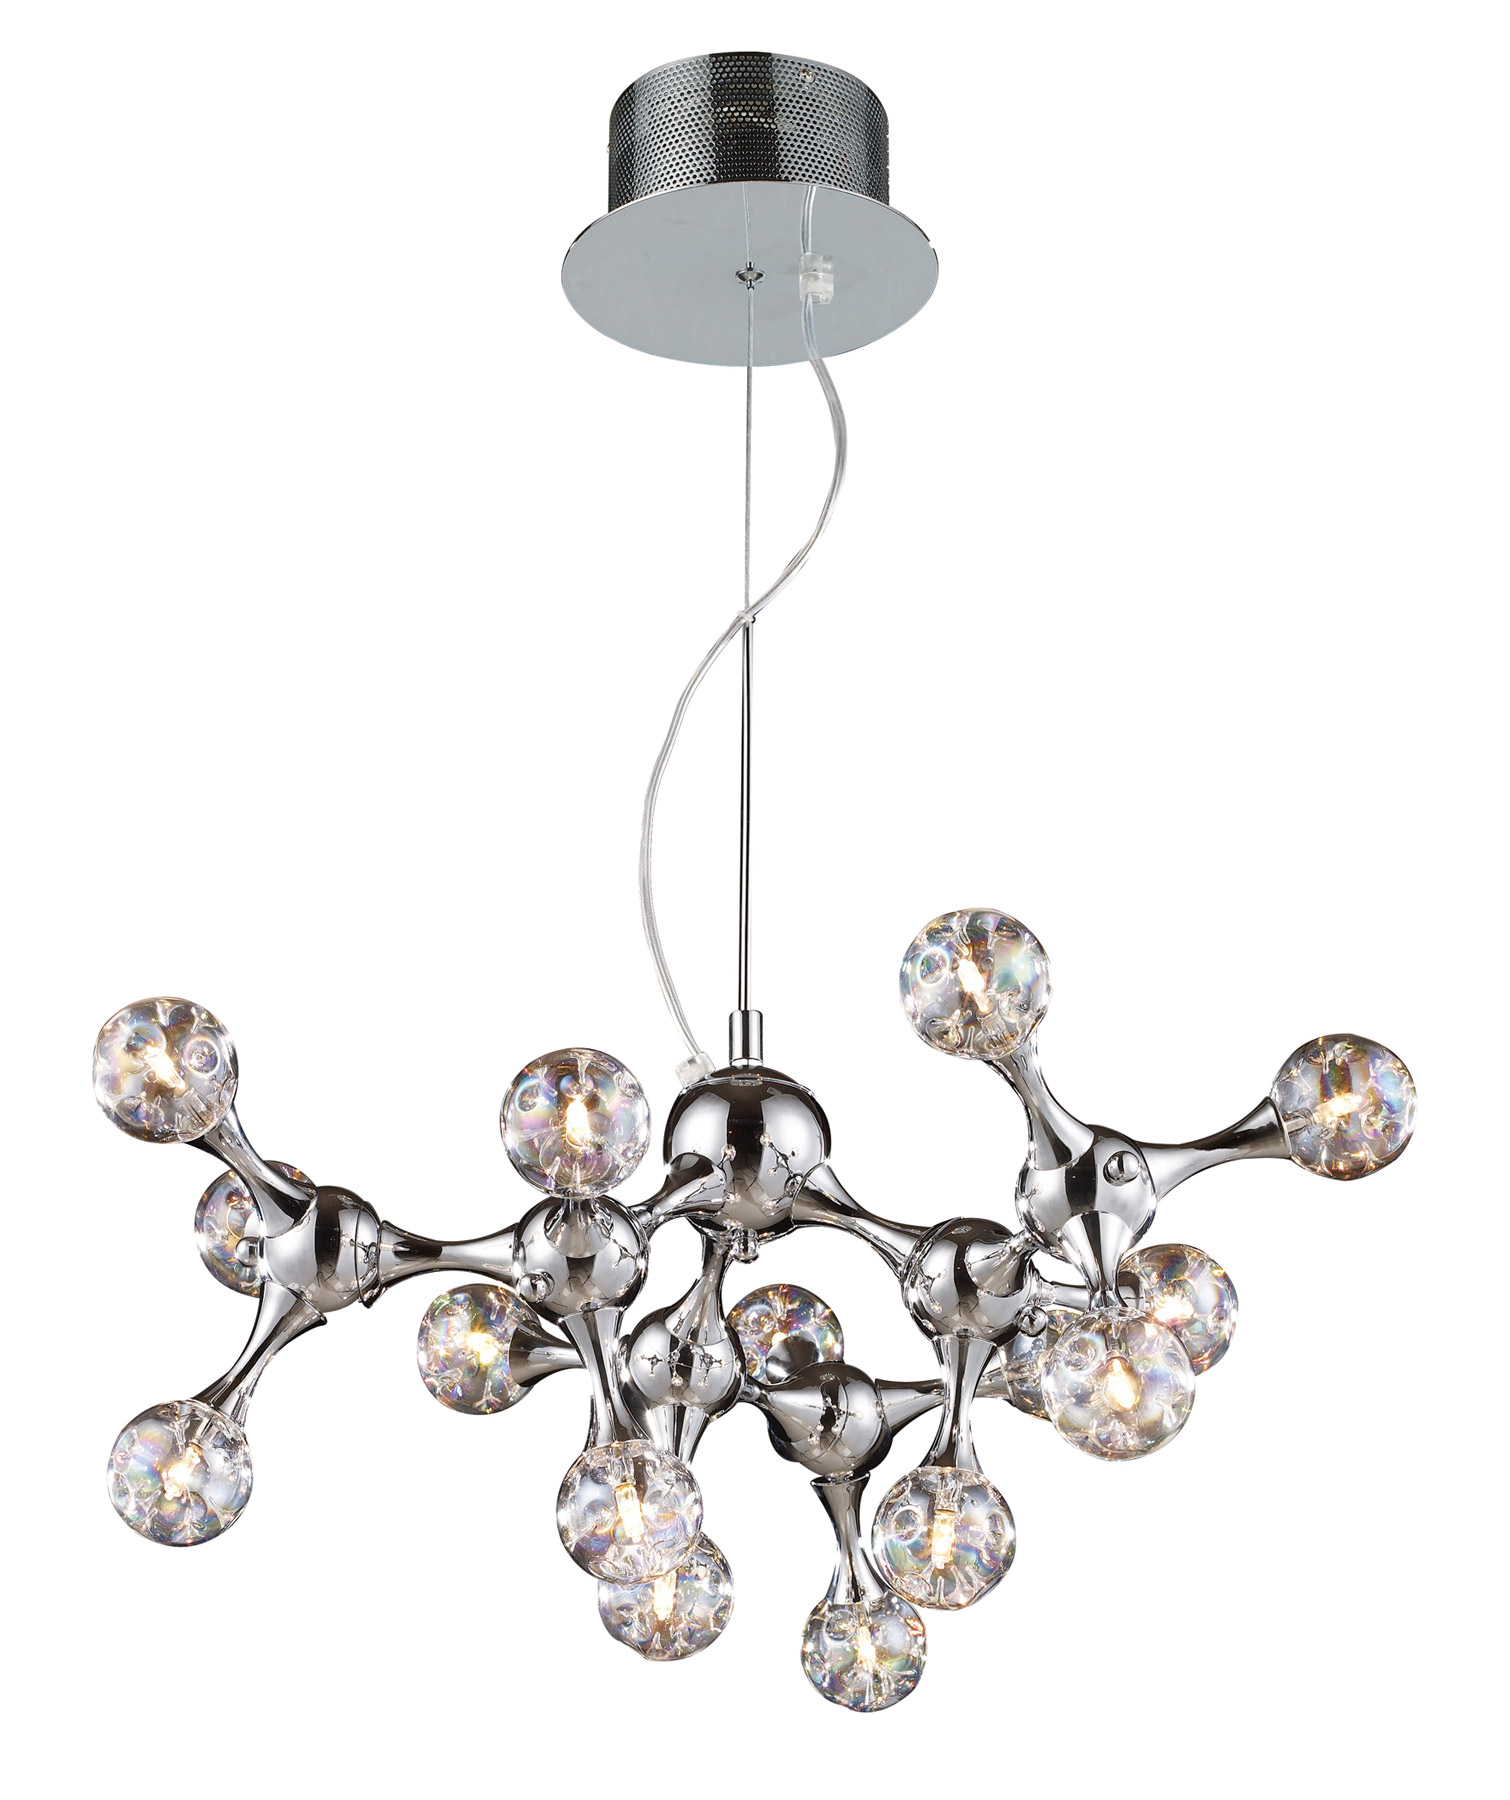 w products light kitchen beige island pendant lampsusa lighting capri nickel with glass elk satin